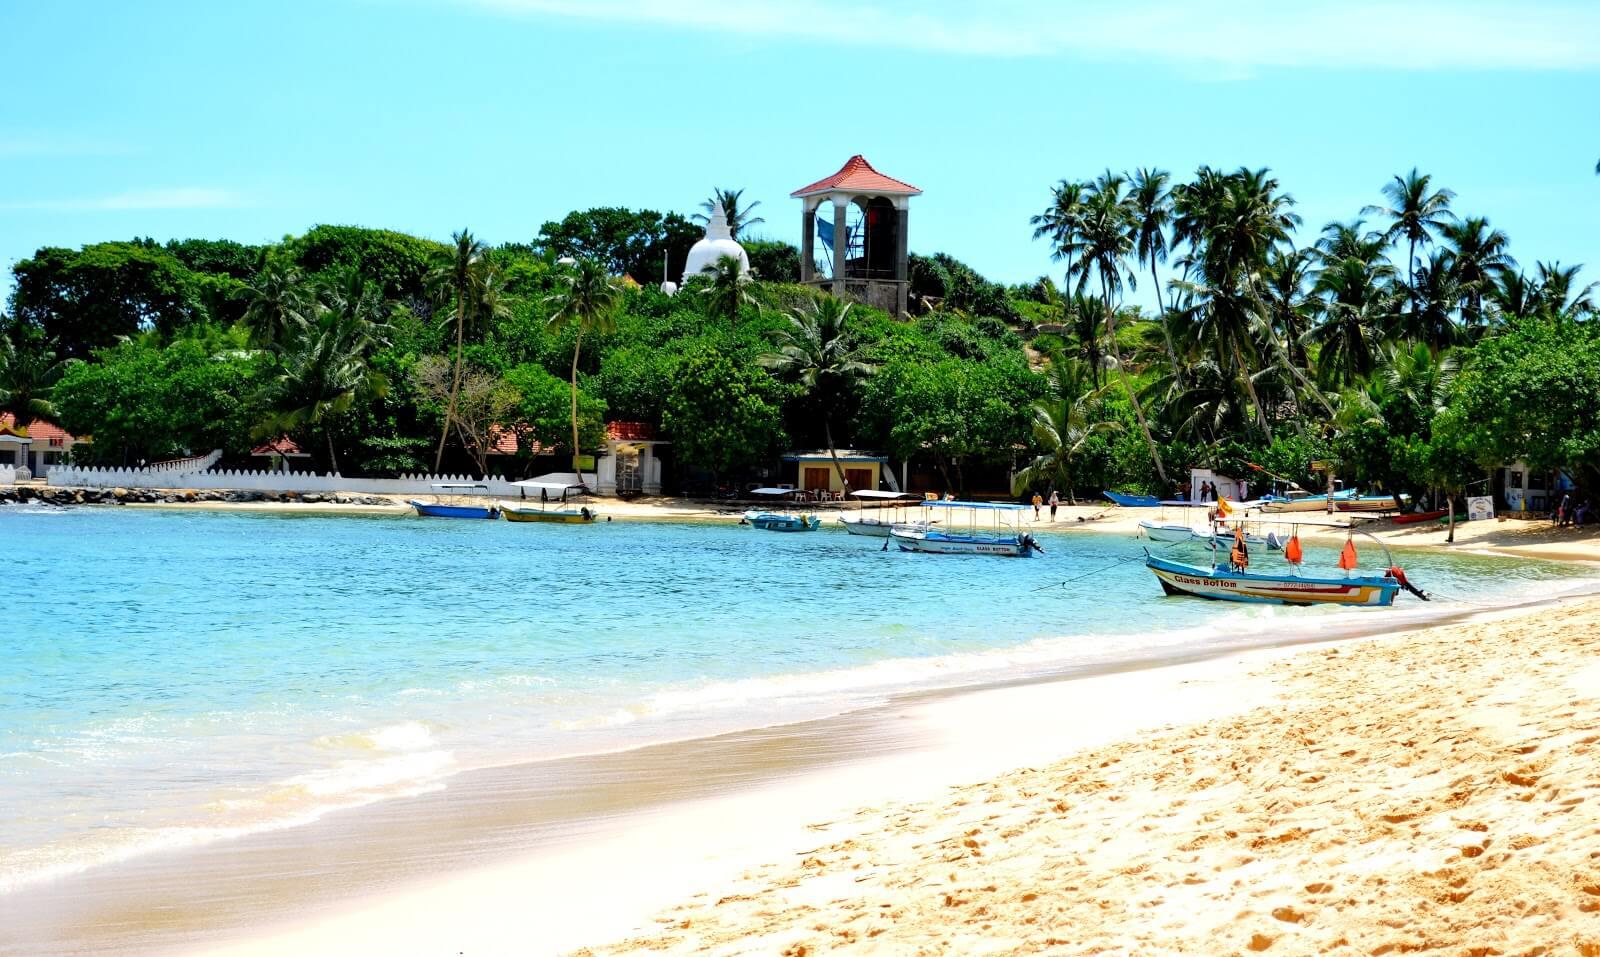 Пляж в городе Унаватуна, Шри-Ланка